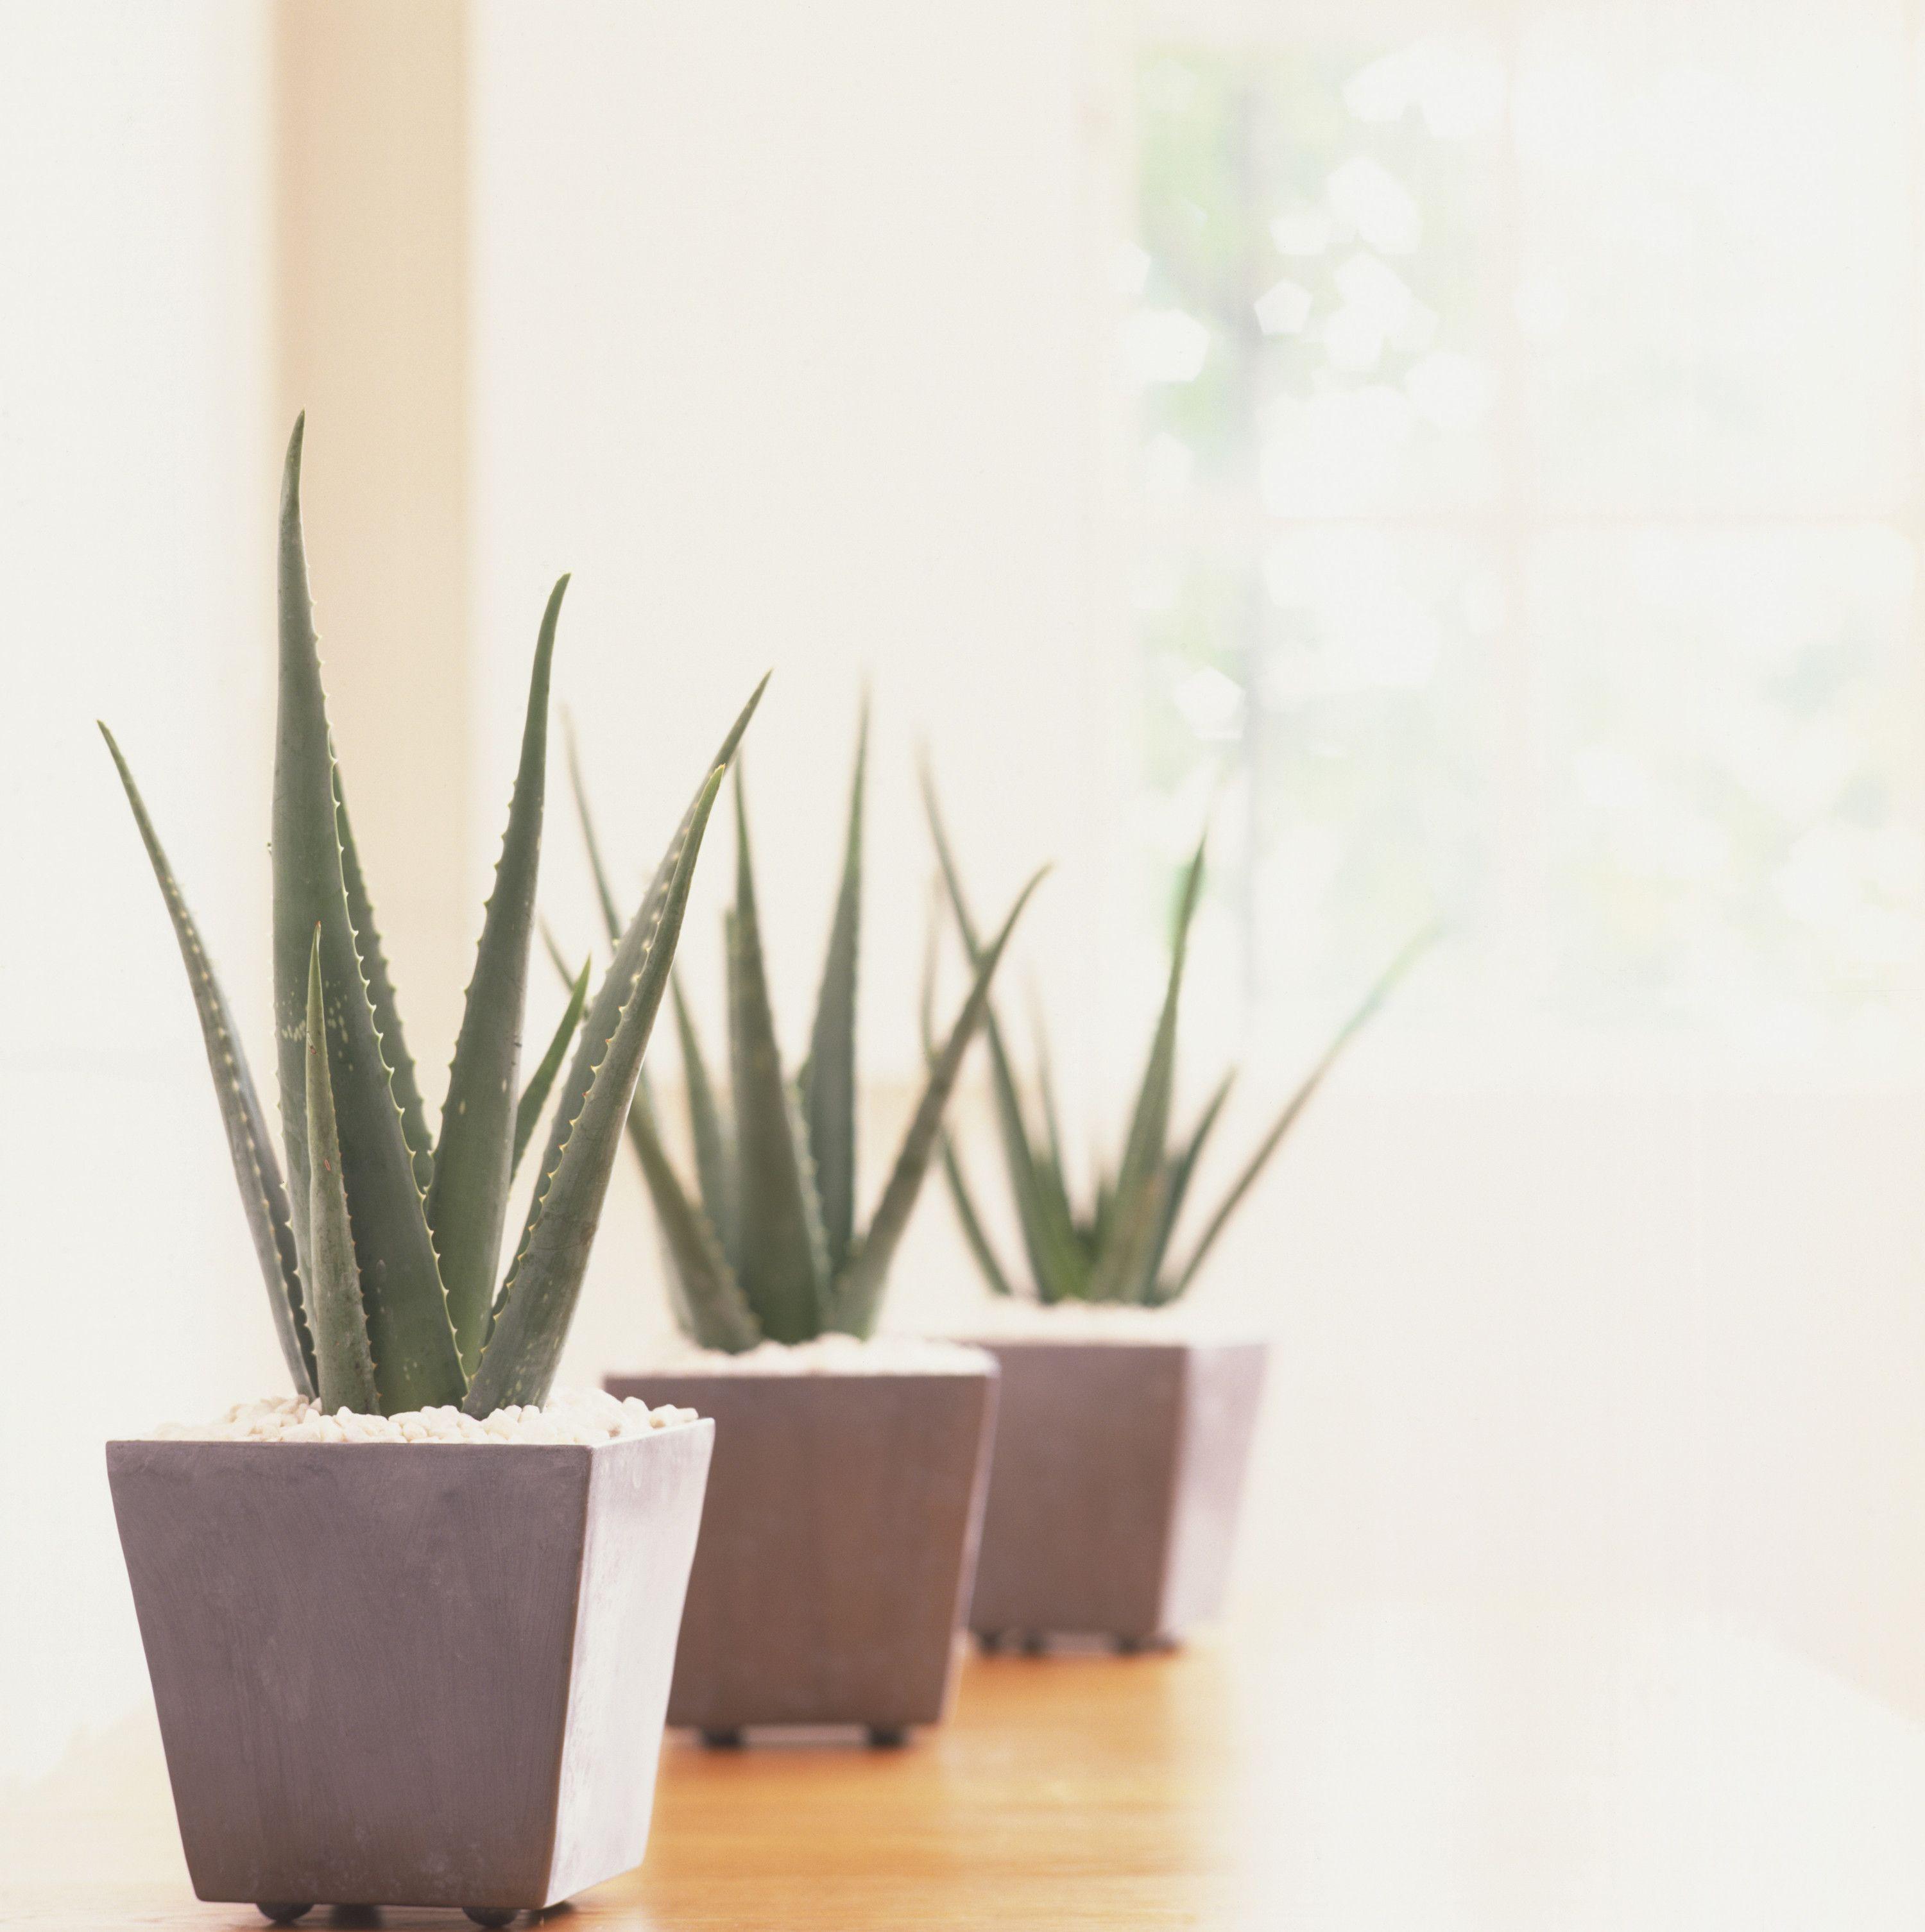 25 Best Indoor Plants For Apartments - Low-Maintenance